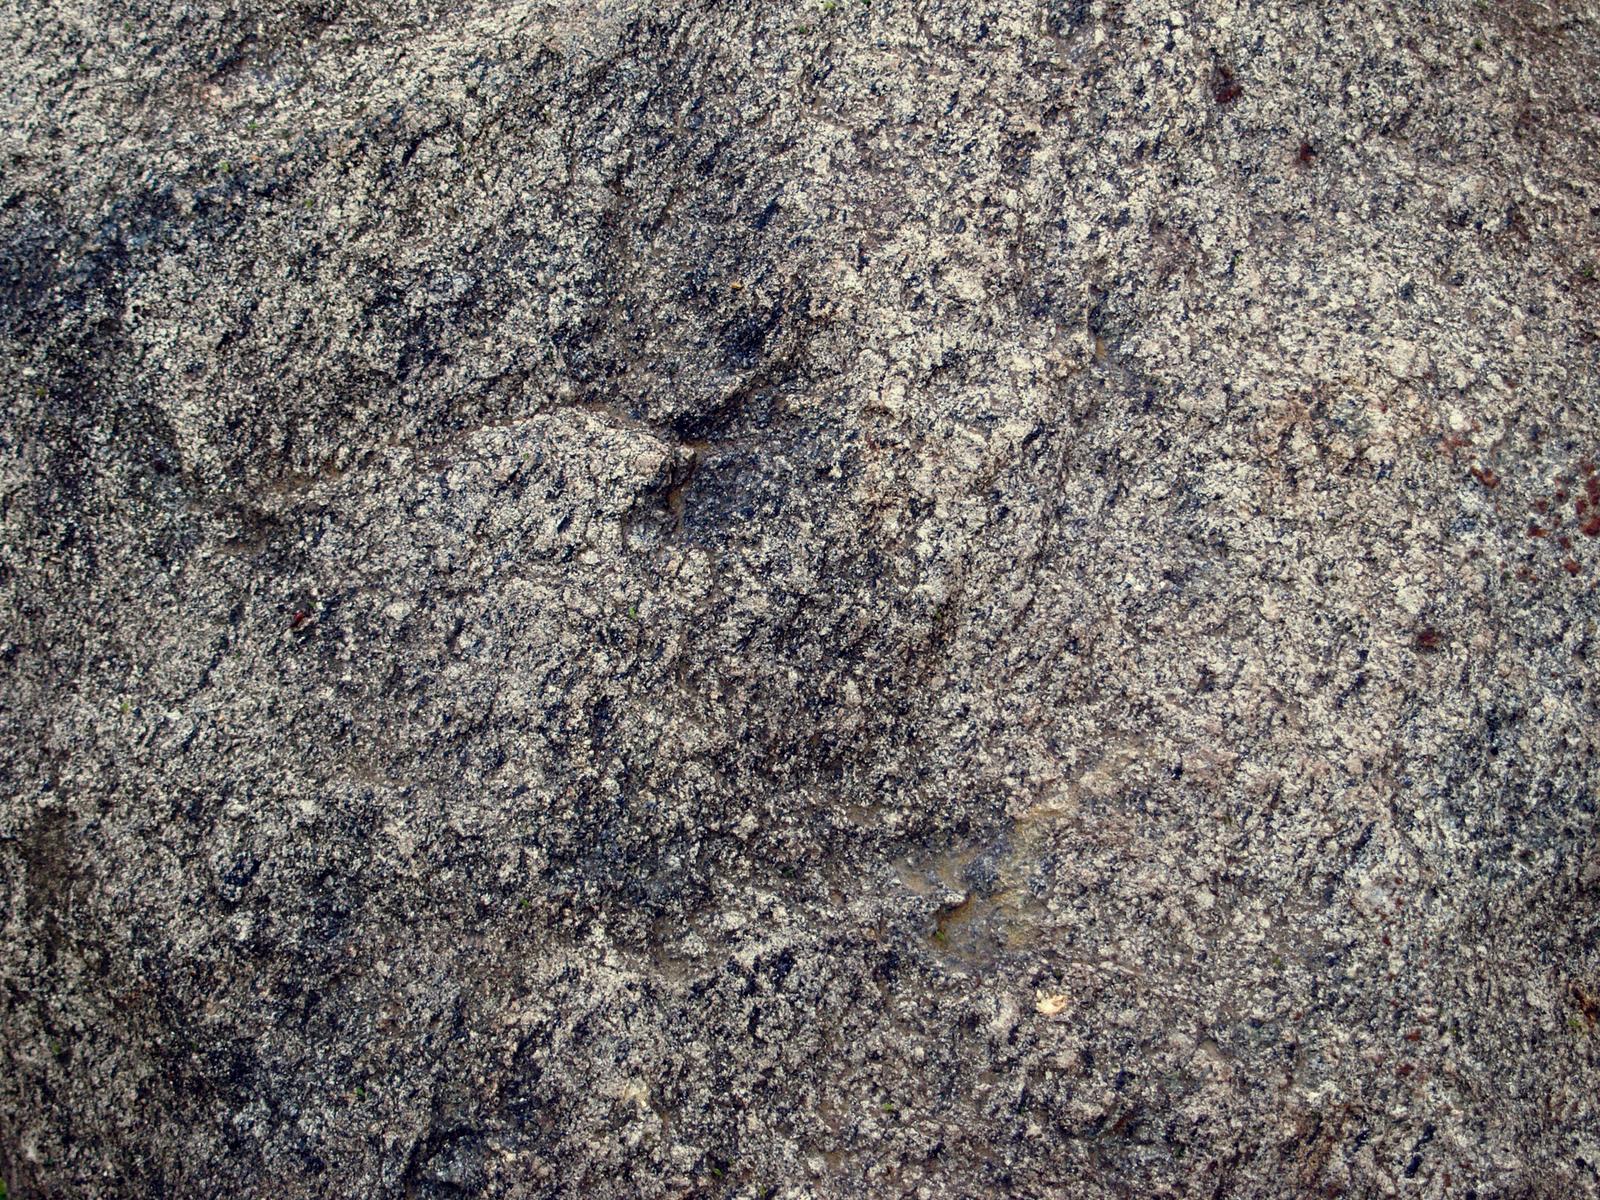 Granite And : reusage-blog-stone-or-rock-texture-granite-that-looks-like-the ...